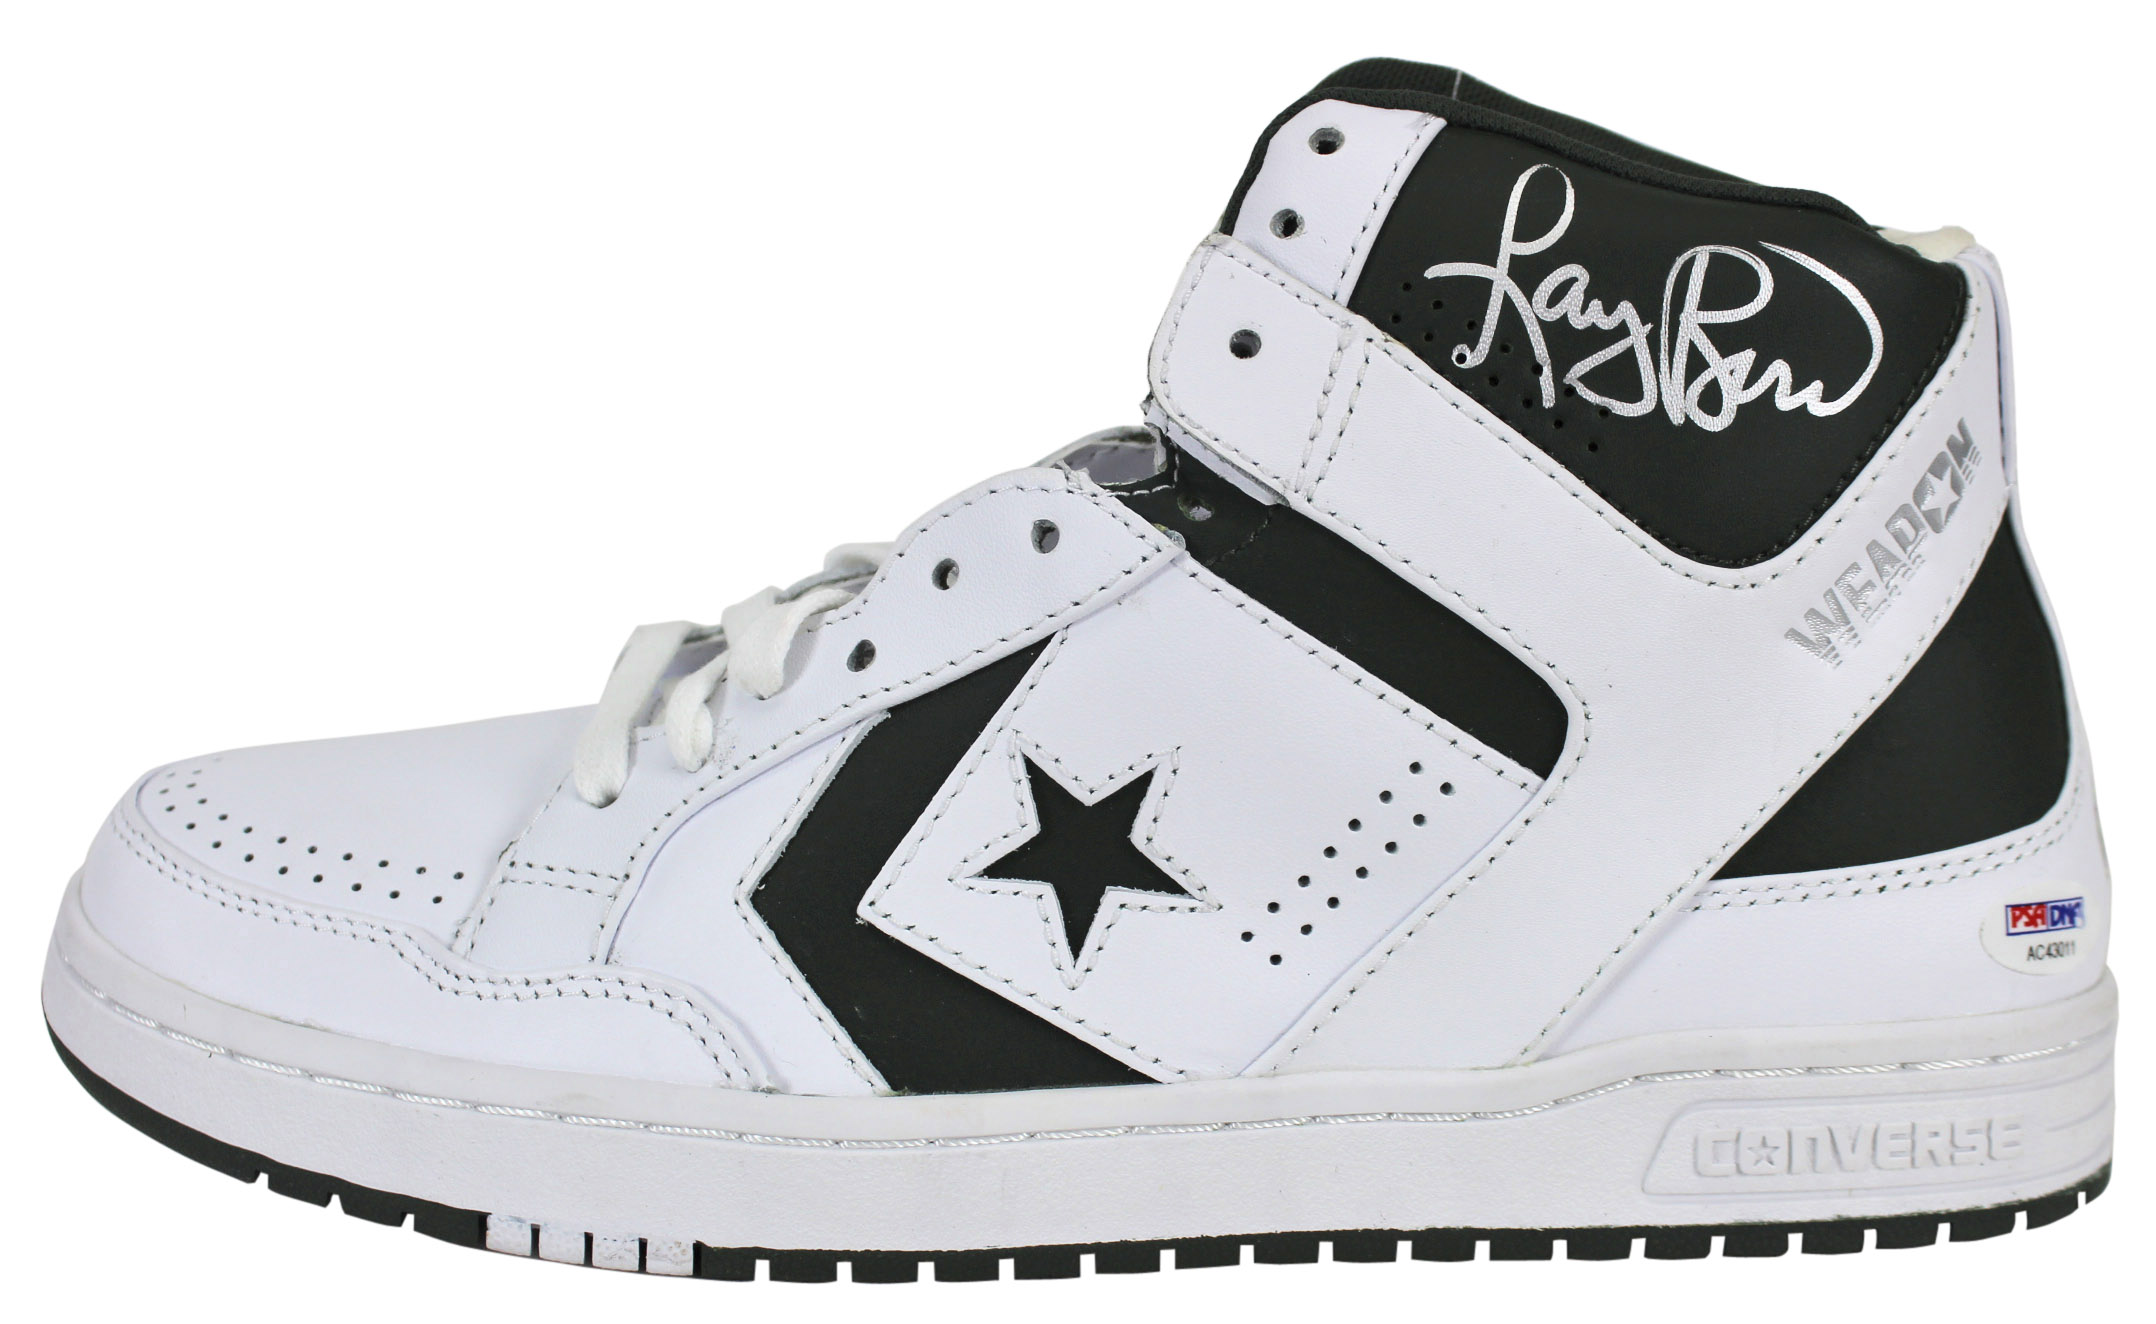 fa3e71839ee6 Celtics Larry Bird Signed White Converse Game Model Shoes PSA DNA ...